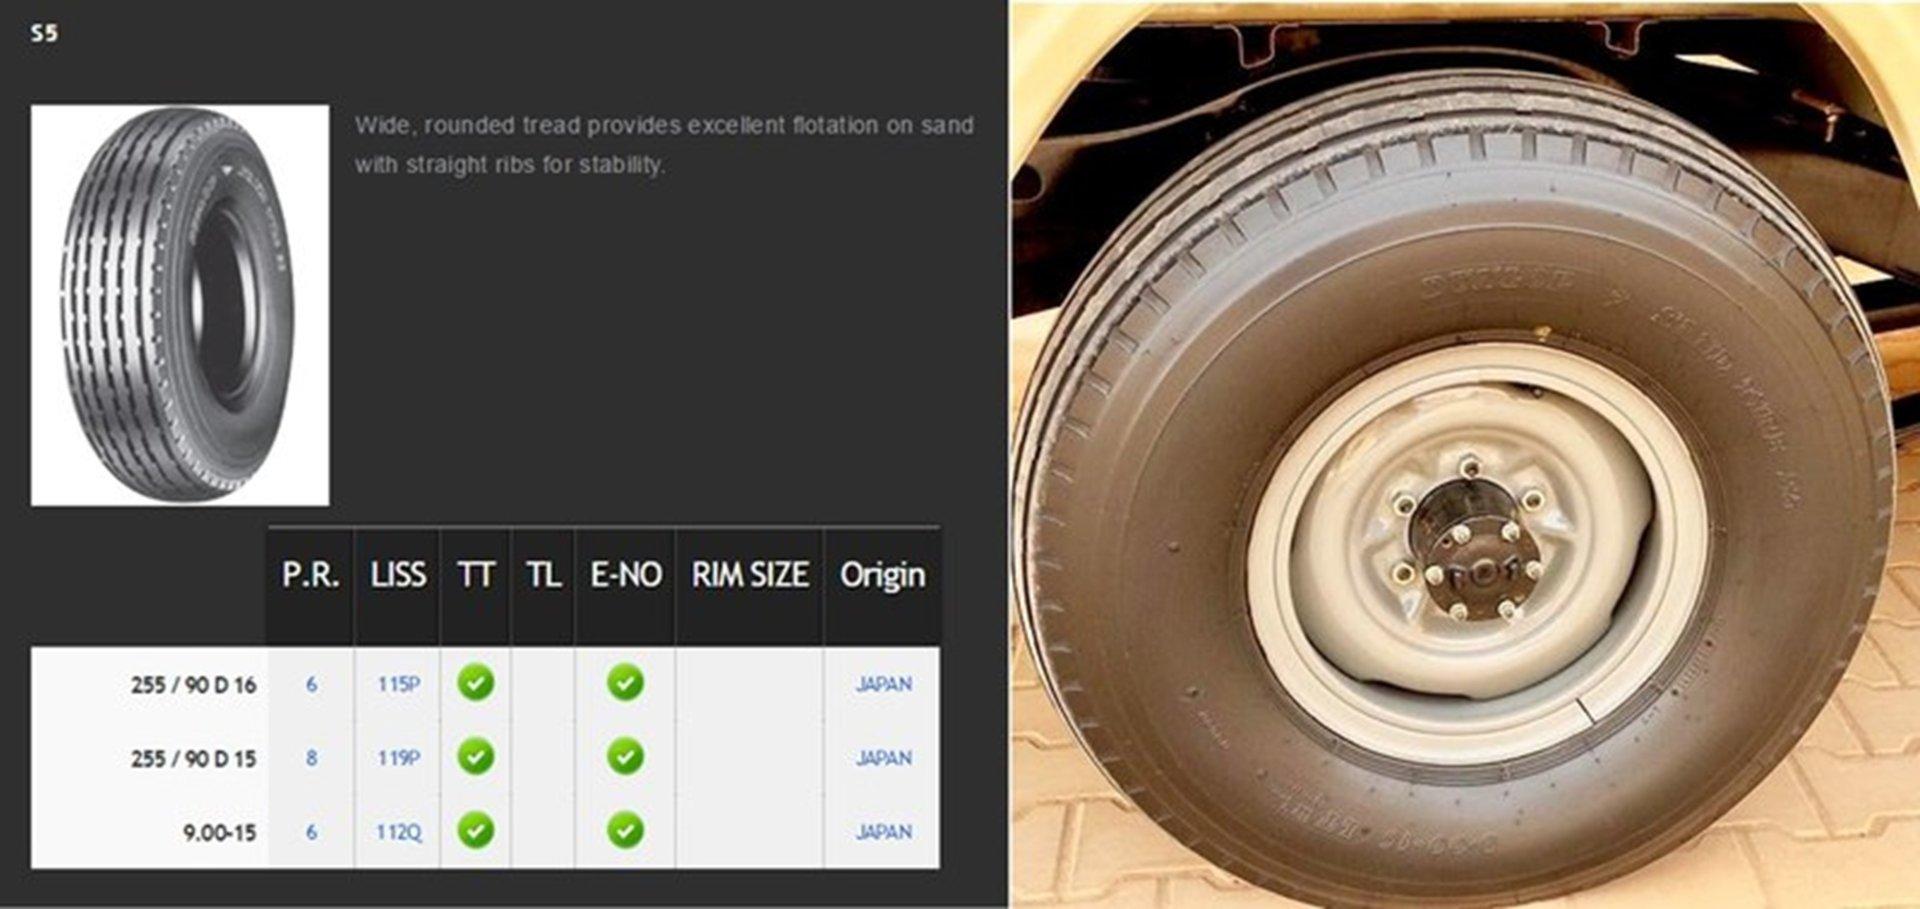 Dunlop S5 sand 9.00 R15.jpg